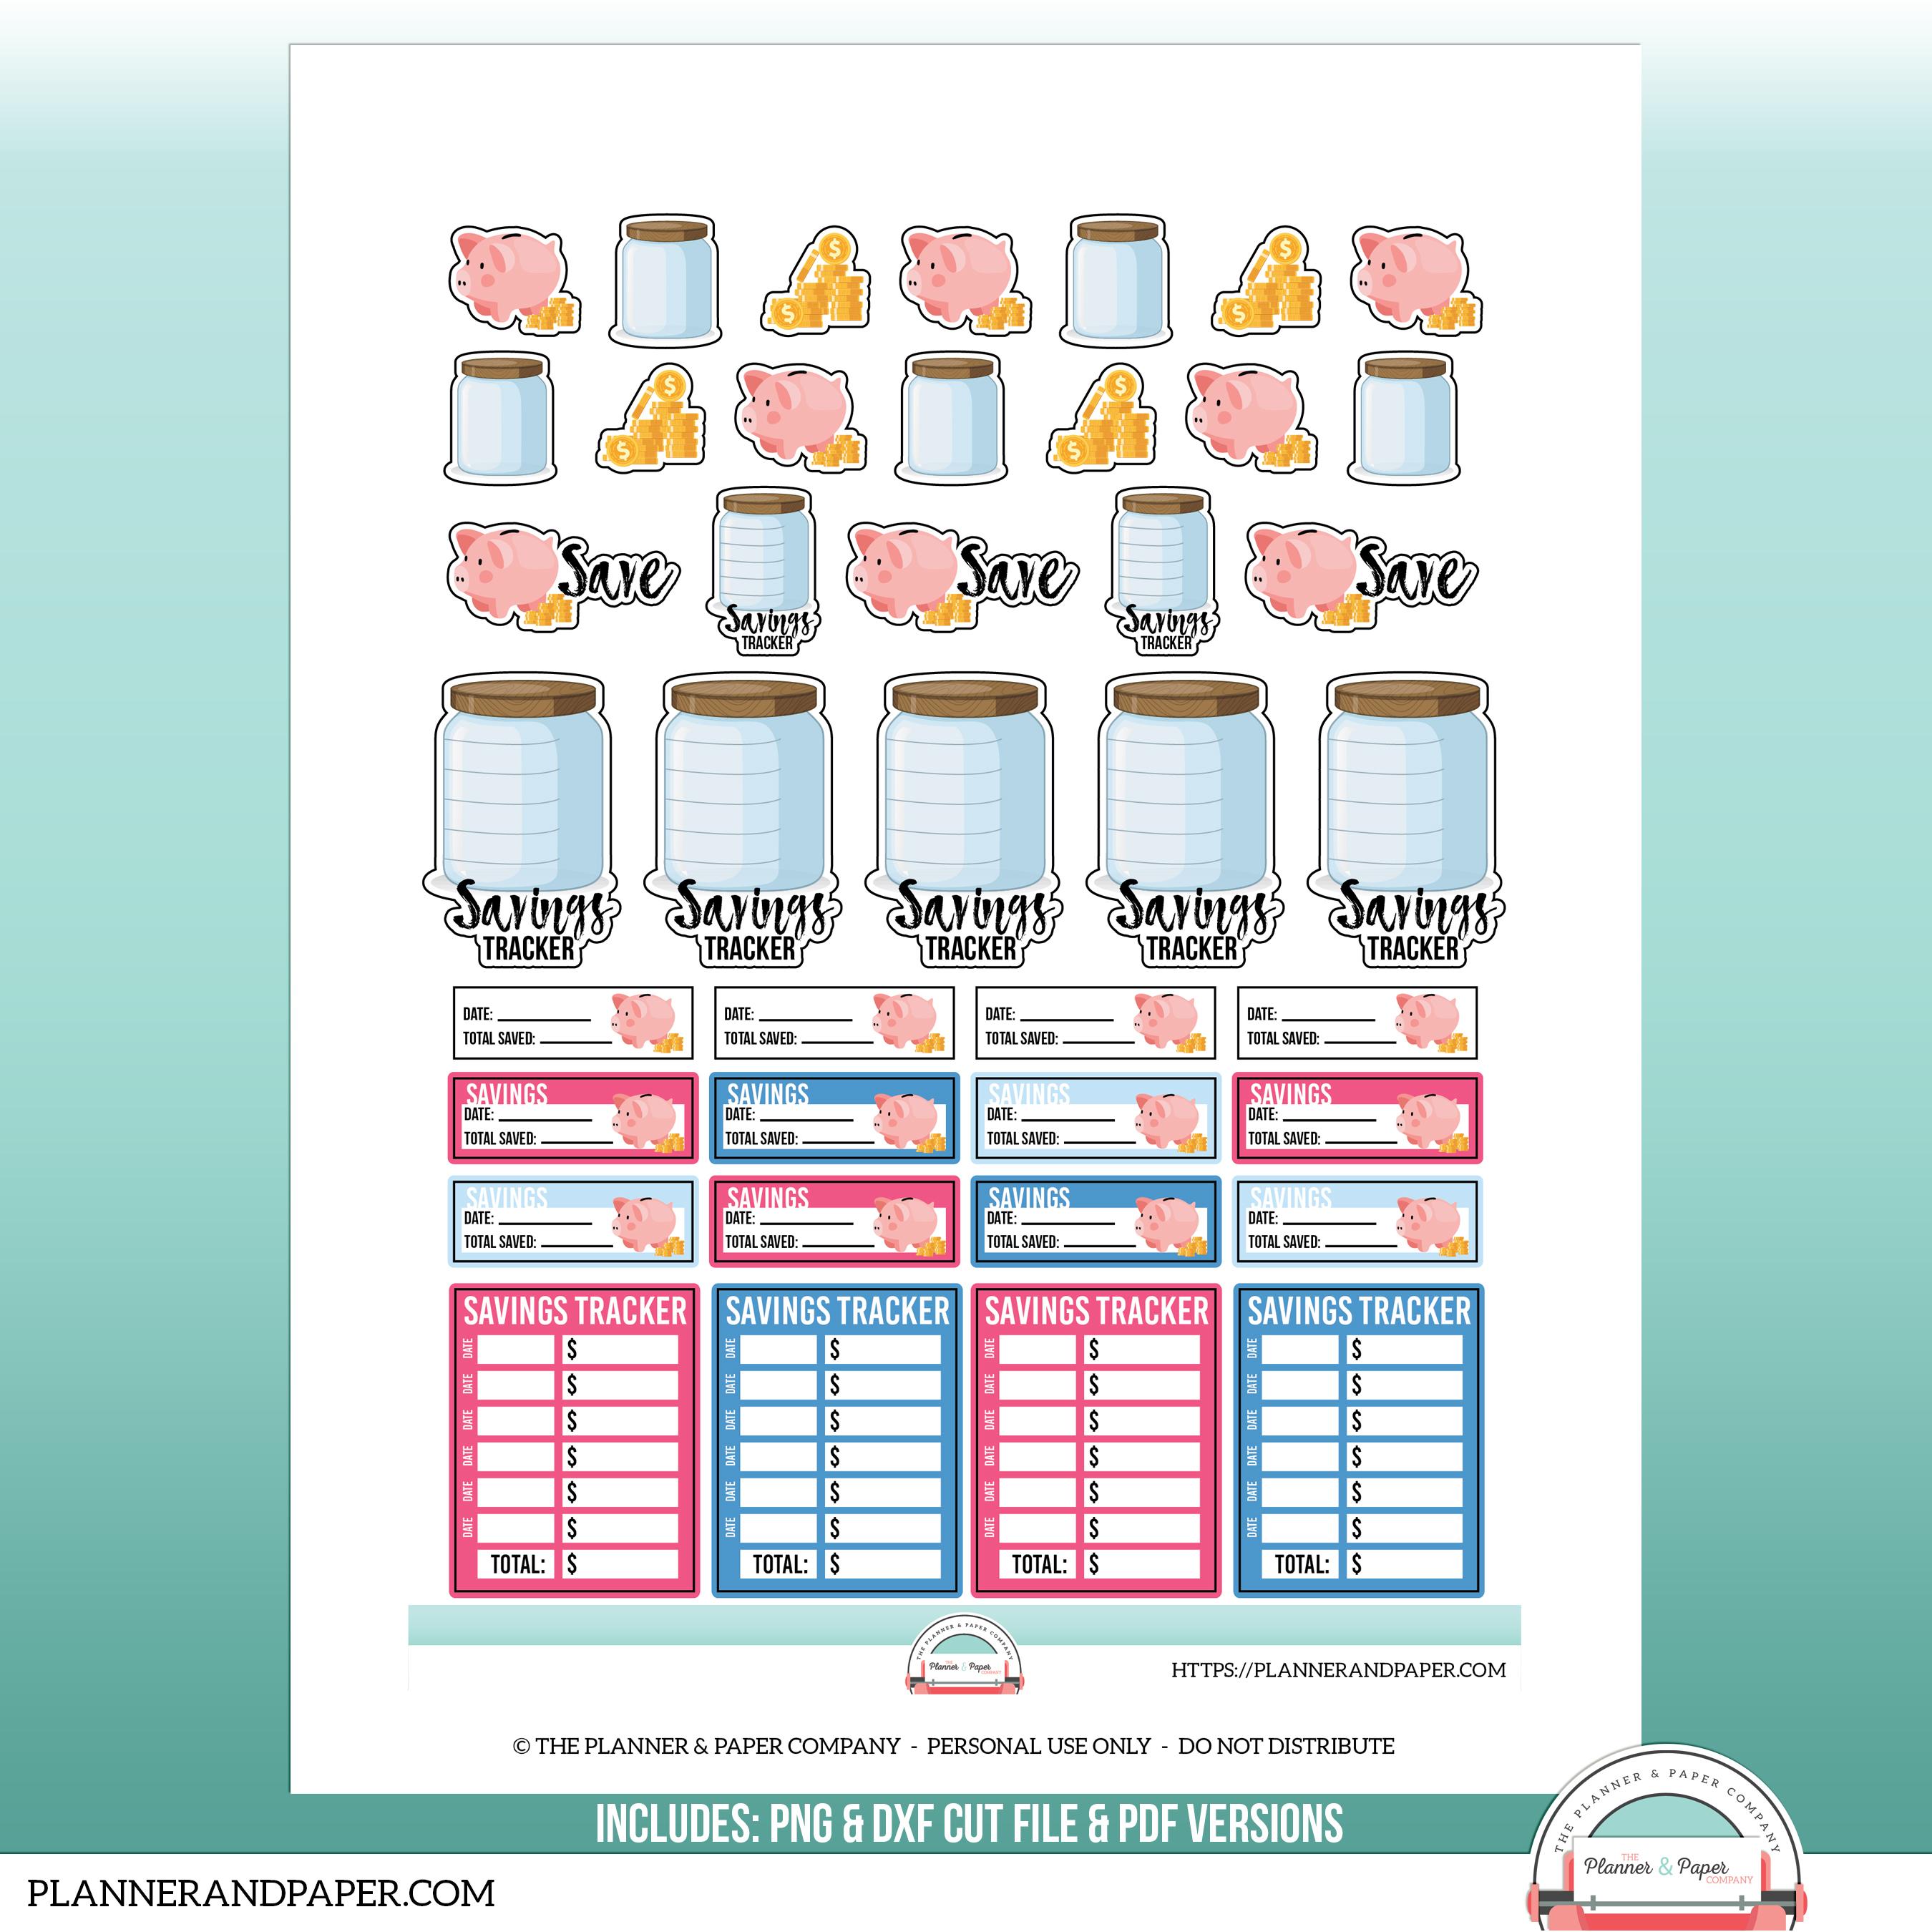 photograph regarding Printable Sticker Sheet titled Printable Preserving Planner Sticker Sheet